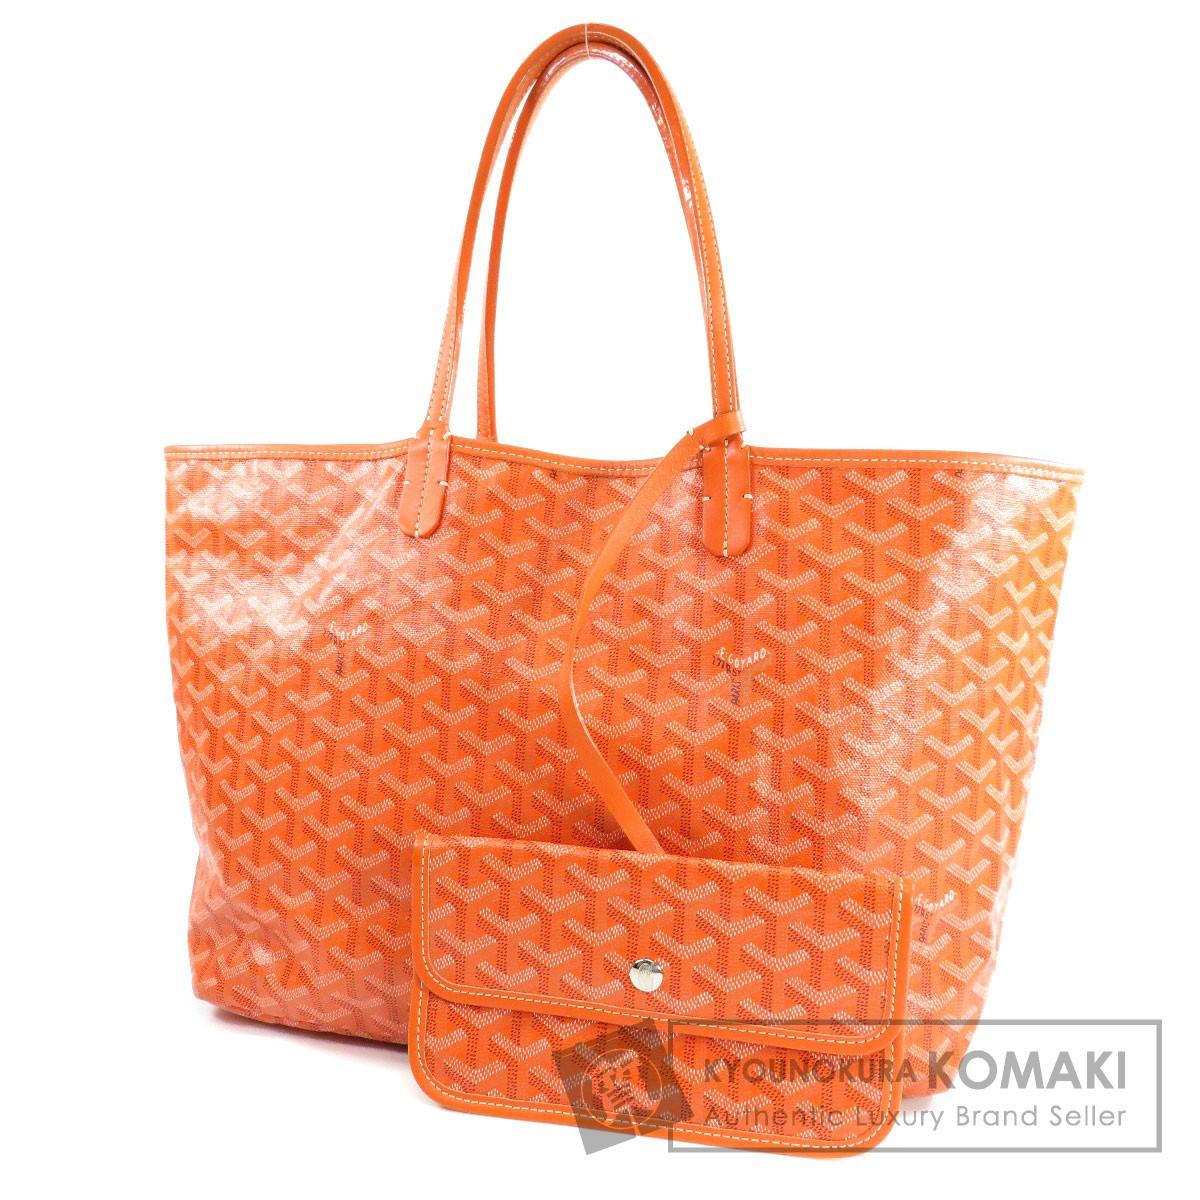 GOYARD サンルイPM トートバッグ PVC レディース 【中古】【ゴヤール】